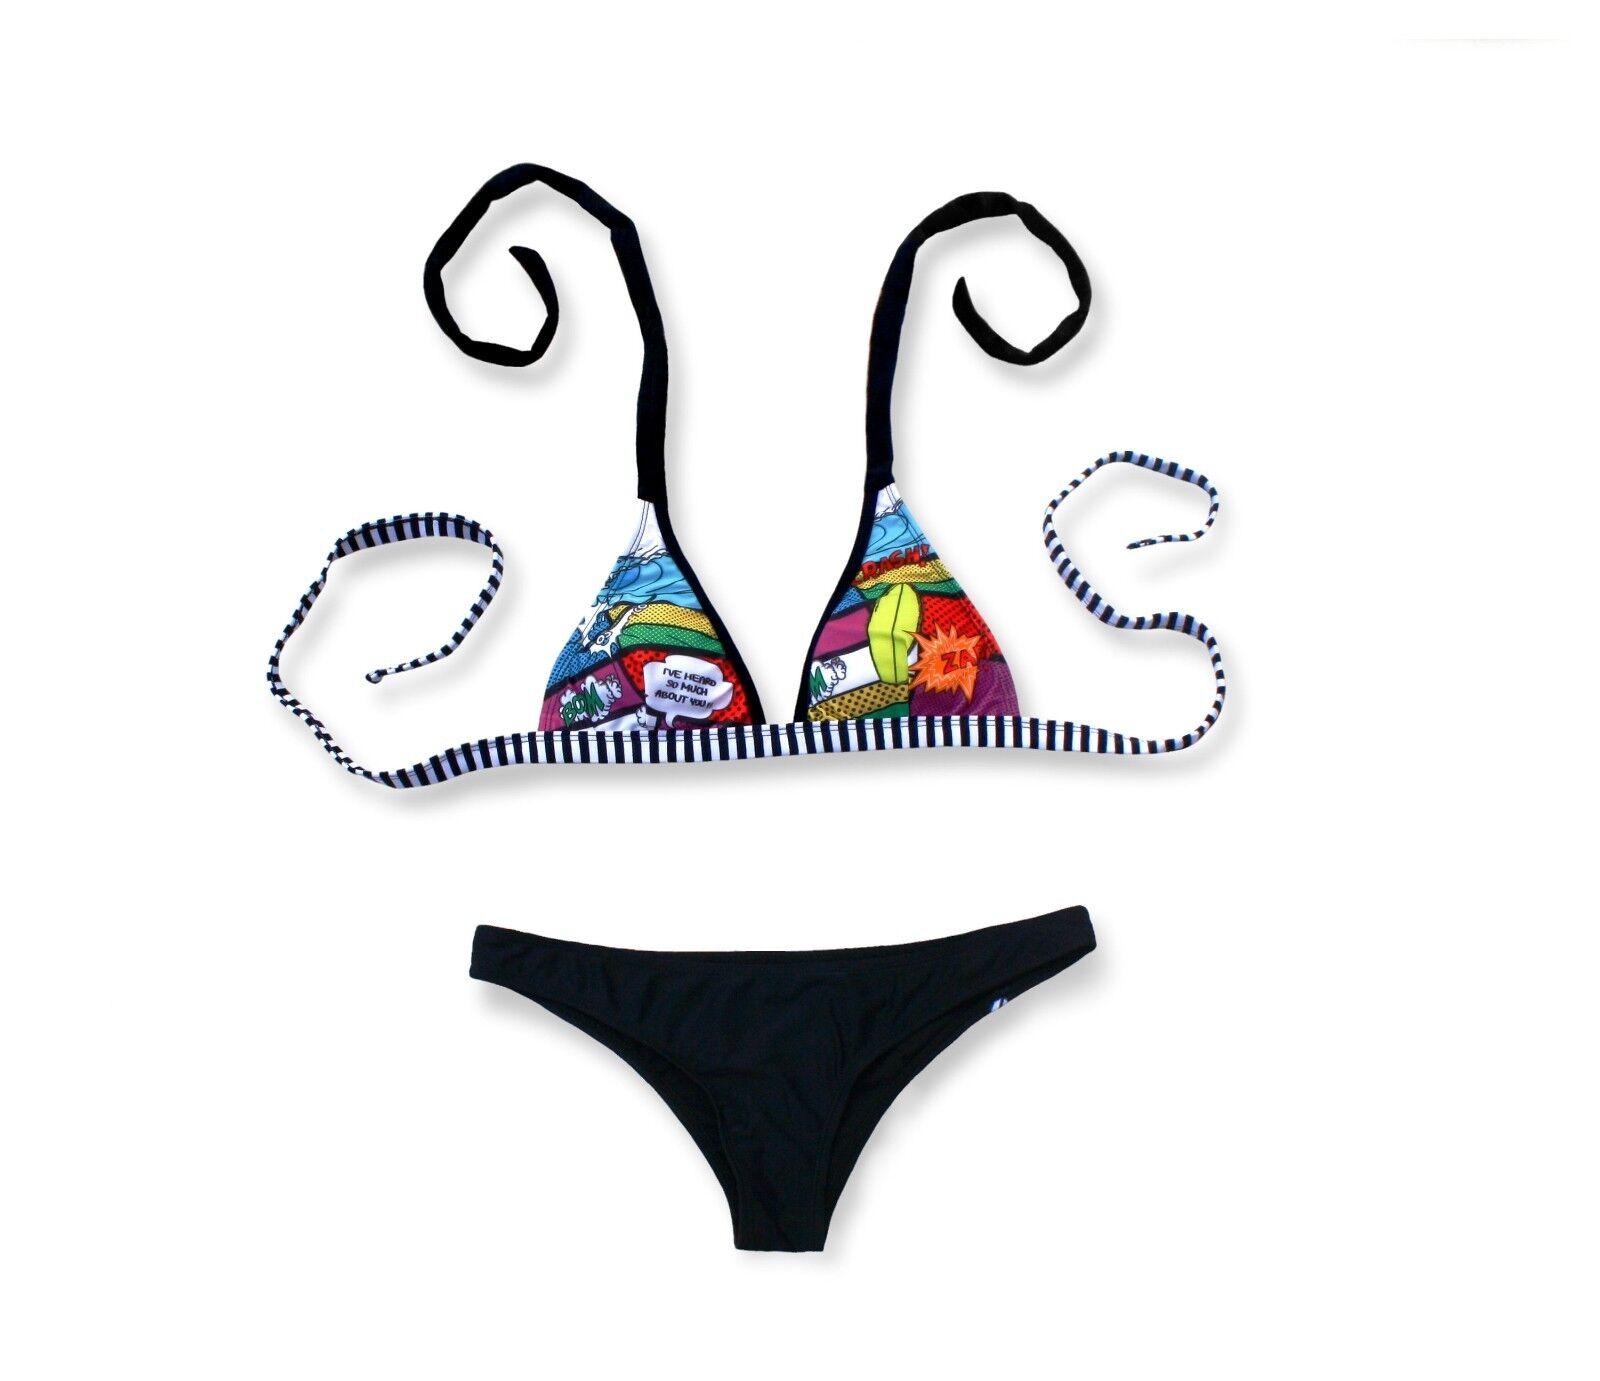 'Comikrow' Bikini by kKrows. Brazilian Style Girls Swimwear. Juniors Size Large.